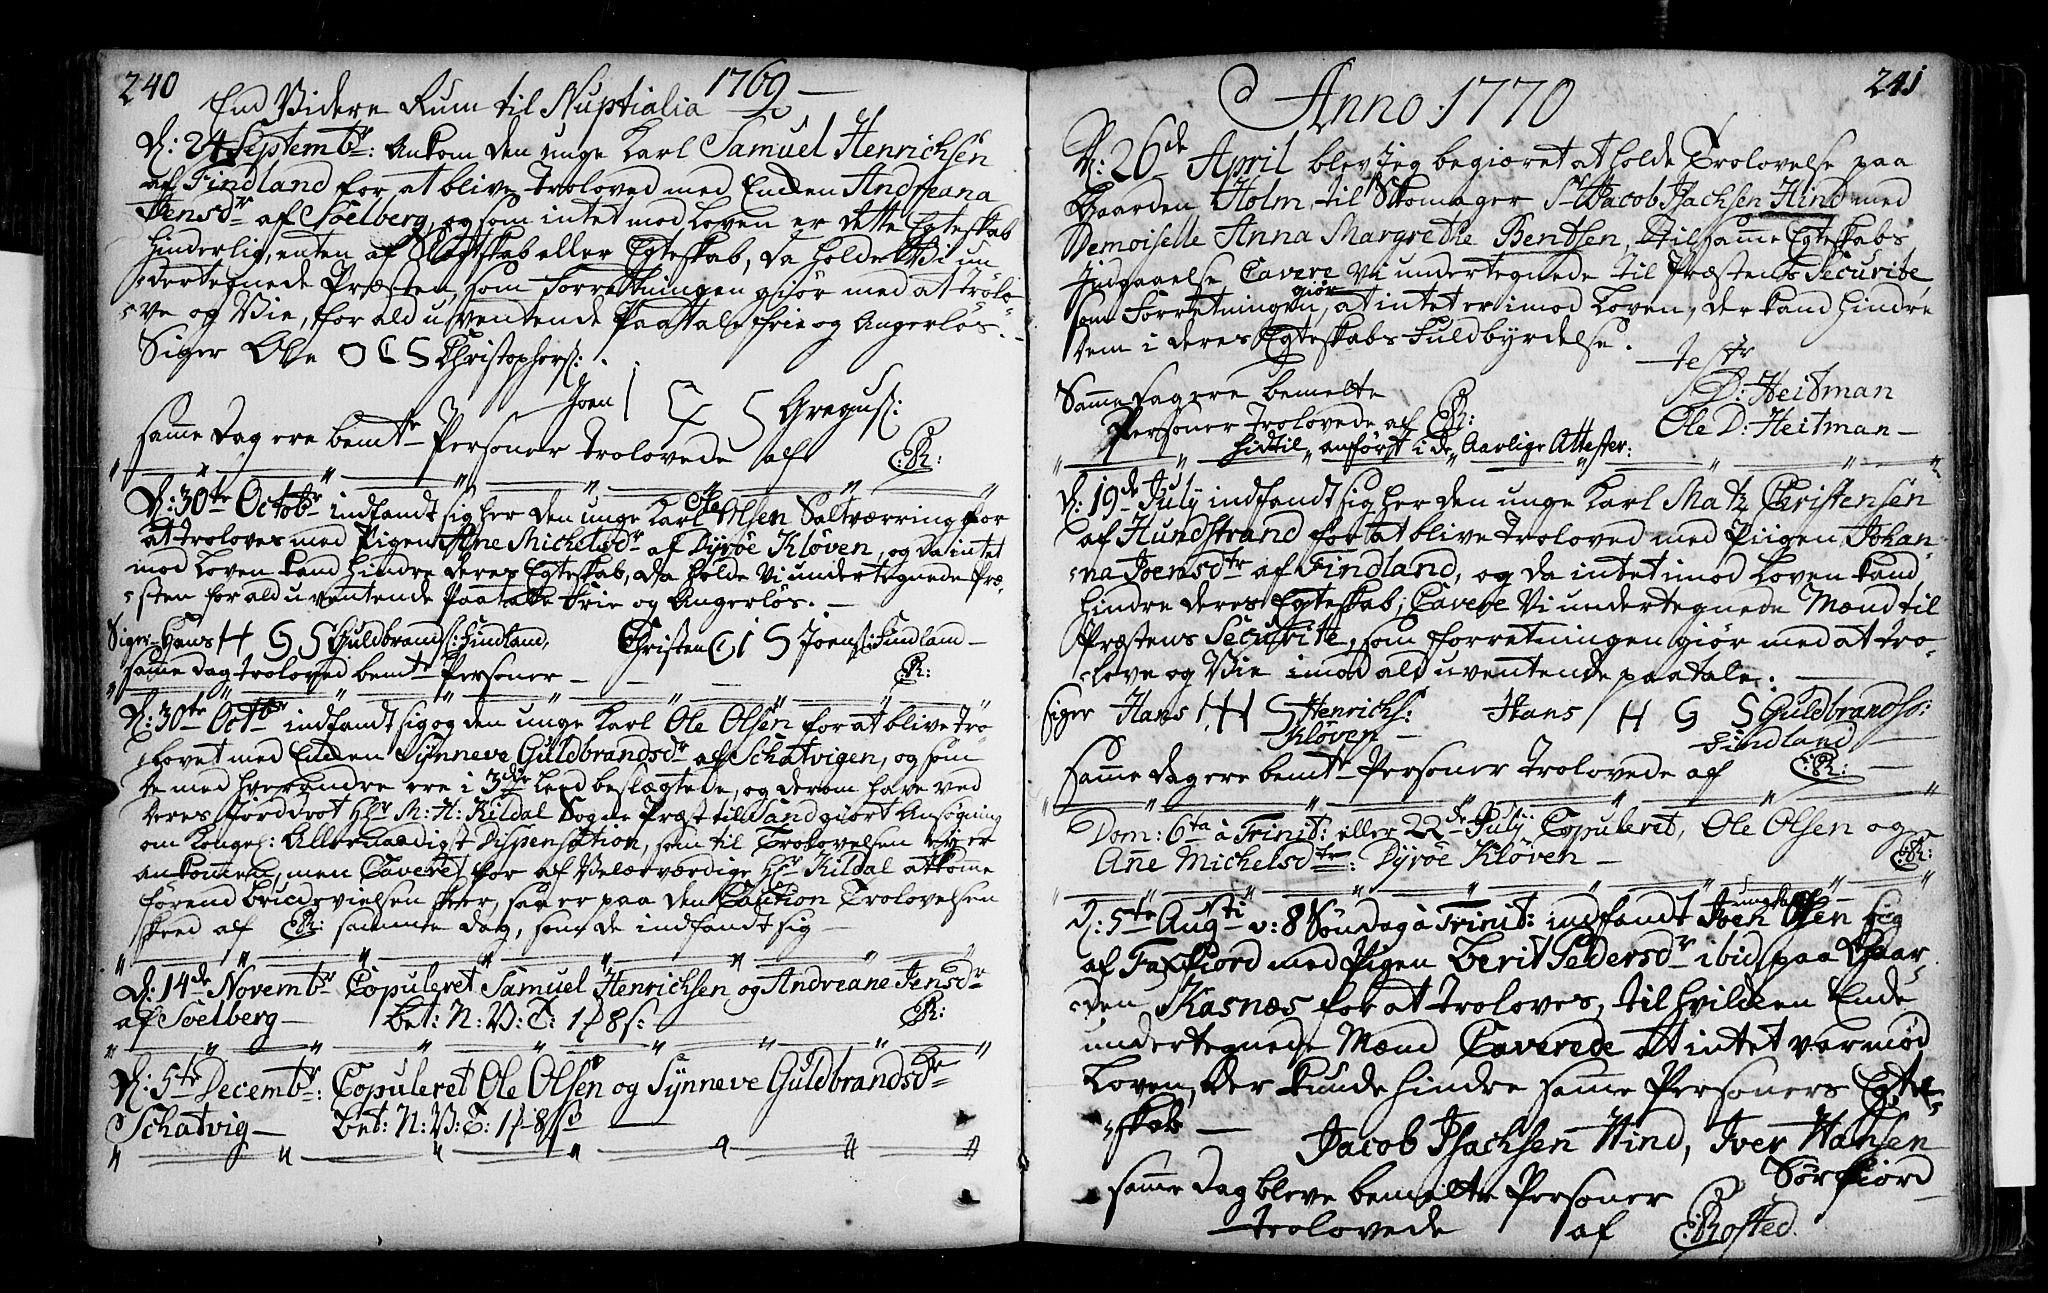 SATØ, Tranøy sokneprestkontor, I/Ia/Iaa/L0001kirke: Ministerialbok nr. 1, 1757-1773, s. 240-241